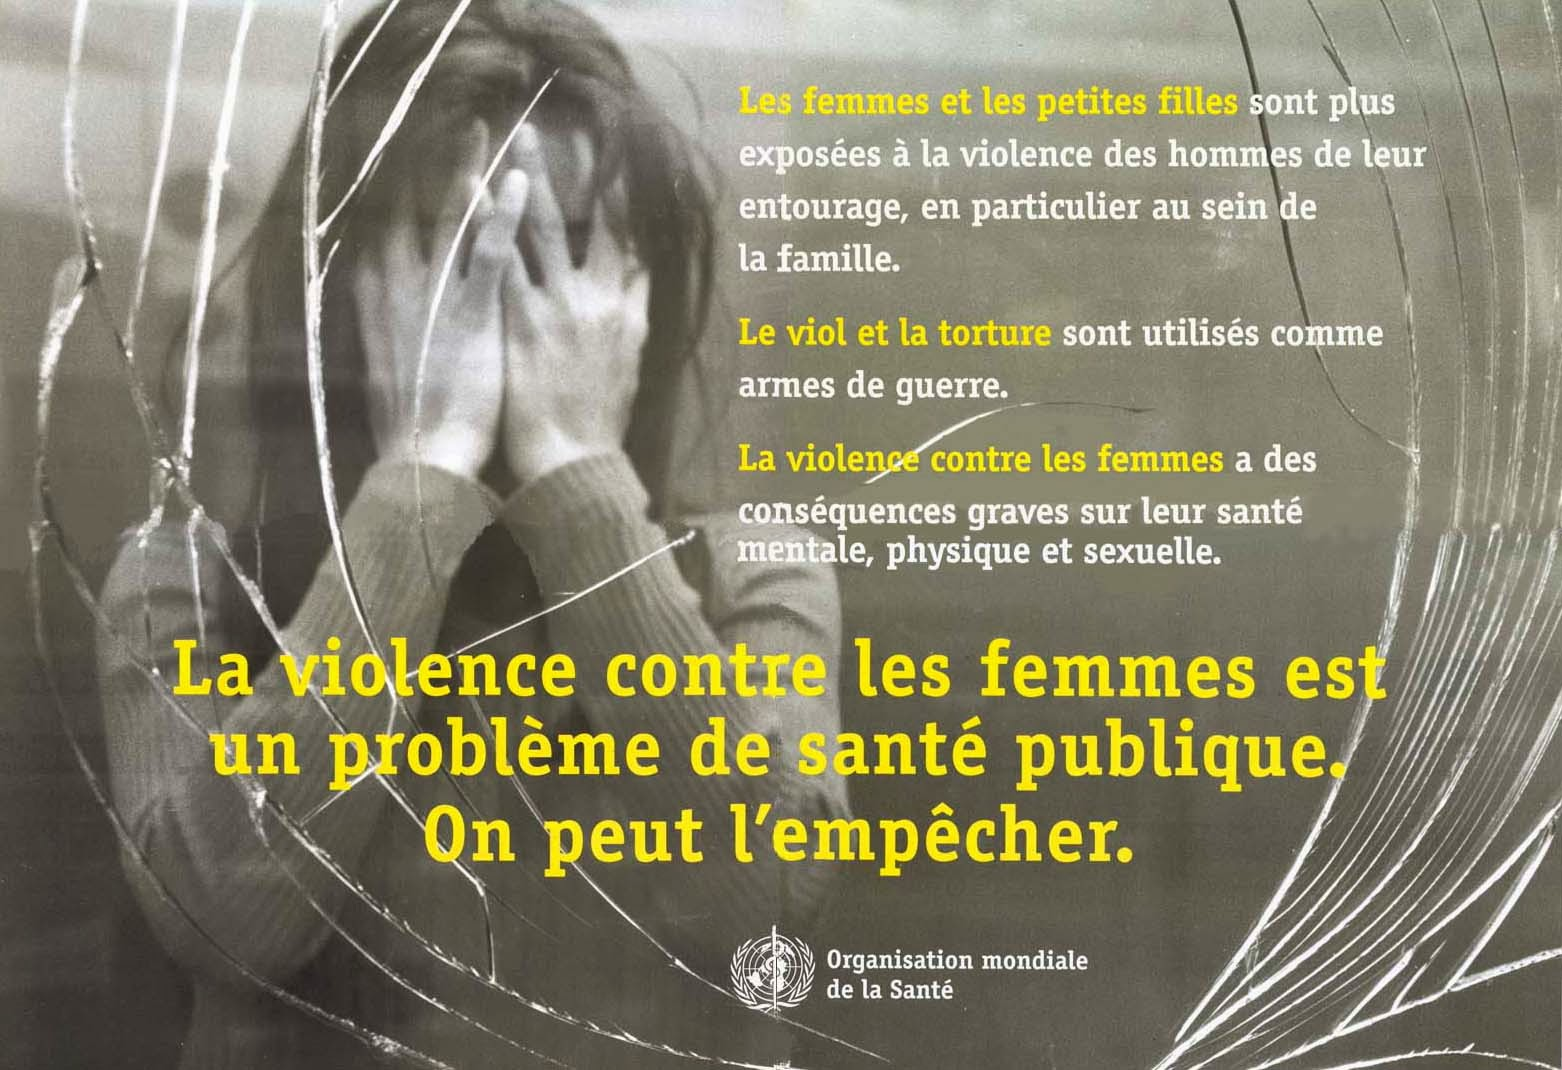 les l ves parlent journ e internationale contre la violence l 39 gard des femmes. Black Bedroom Furniture Sets. Home Design Ideas